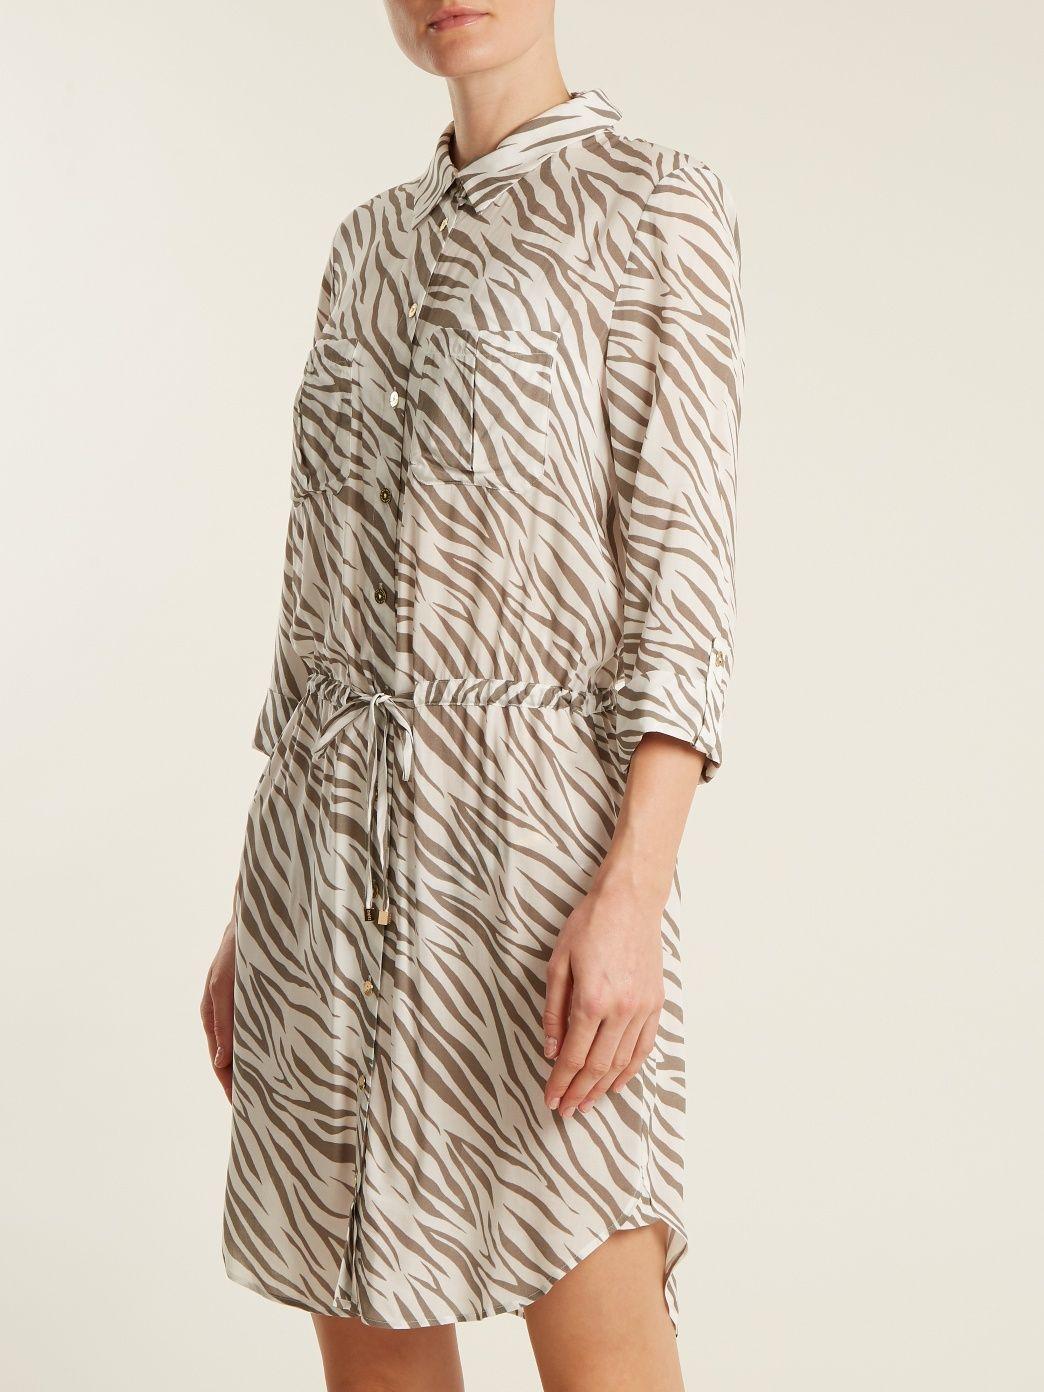 Kalahari zebra-print poplin shirtdress Heidi Klein qpNzz